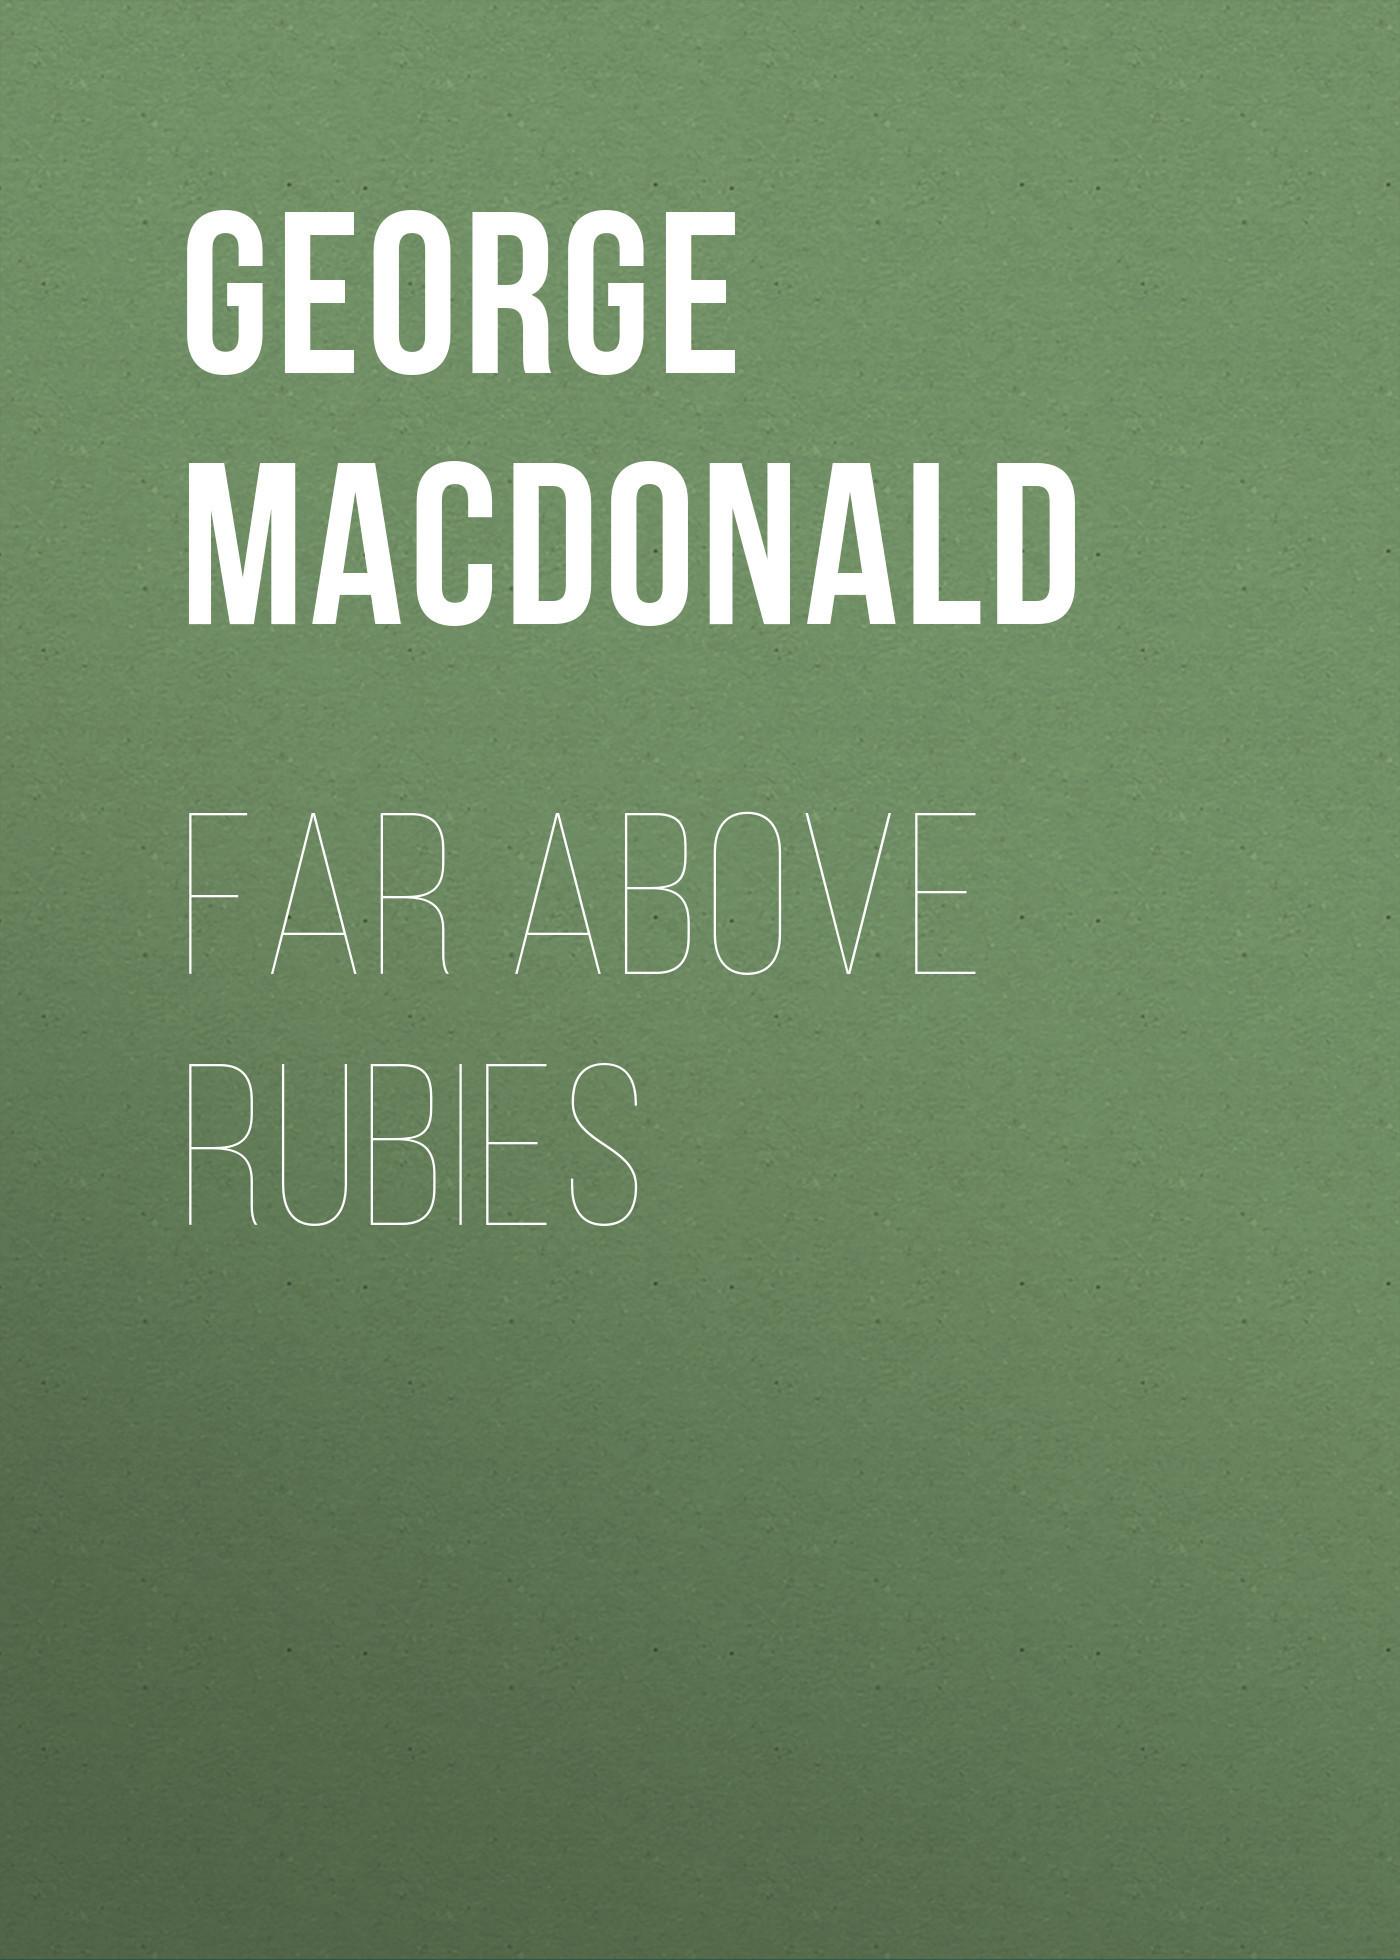 George MacDonald Far Above Rubies